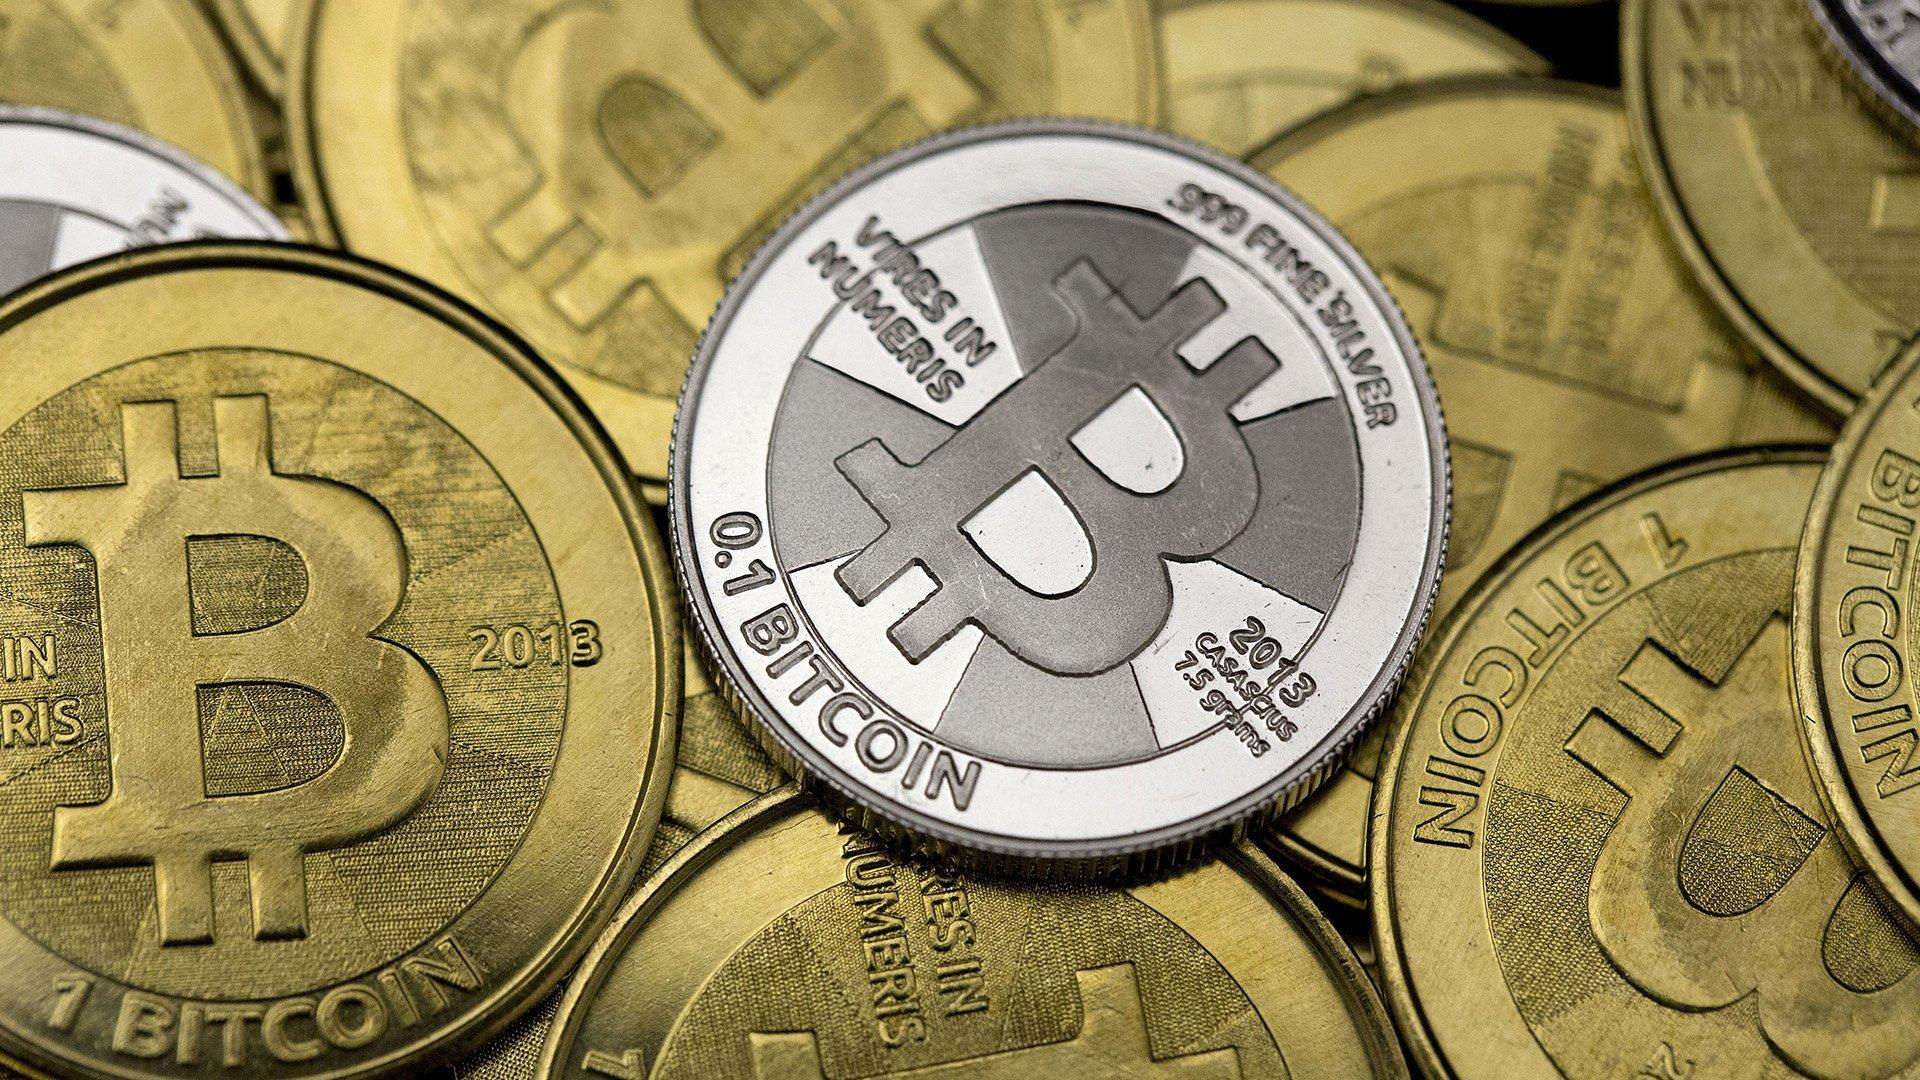 Bitcoin Wallpaper HD 62350 1920x1080px 1920x1080